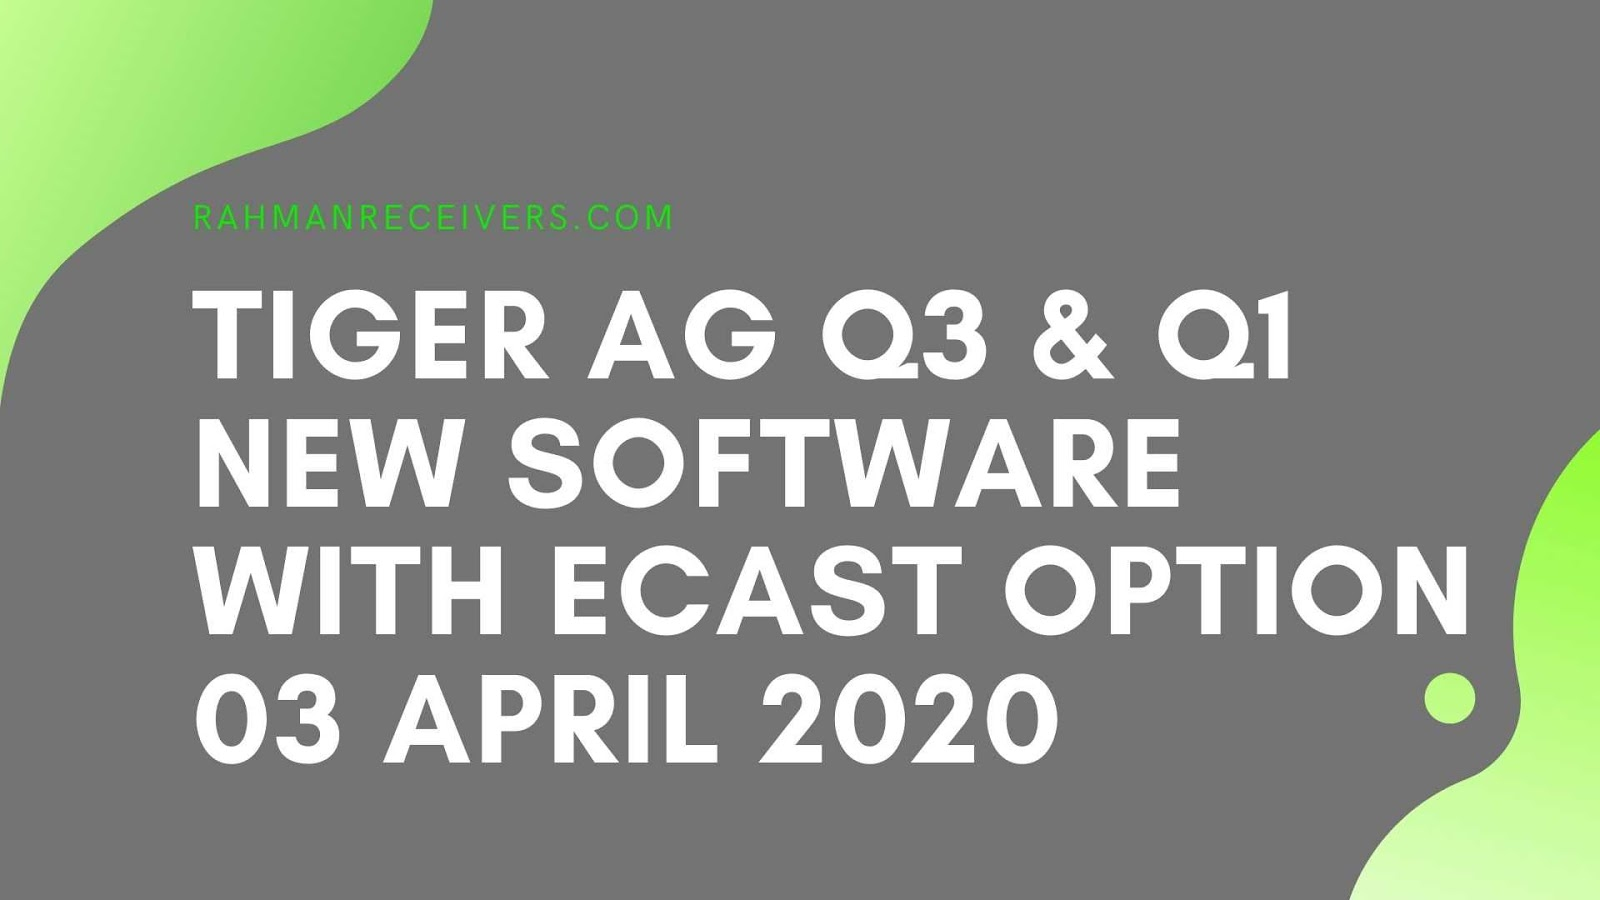 TIGER AG Q3 & Q1 NEW SOFTWARE WITH ECAST OPTION 03 APRIL 2020